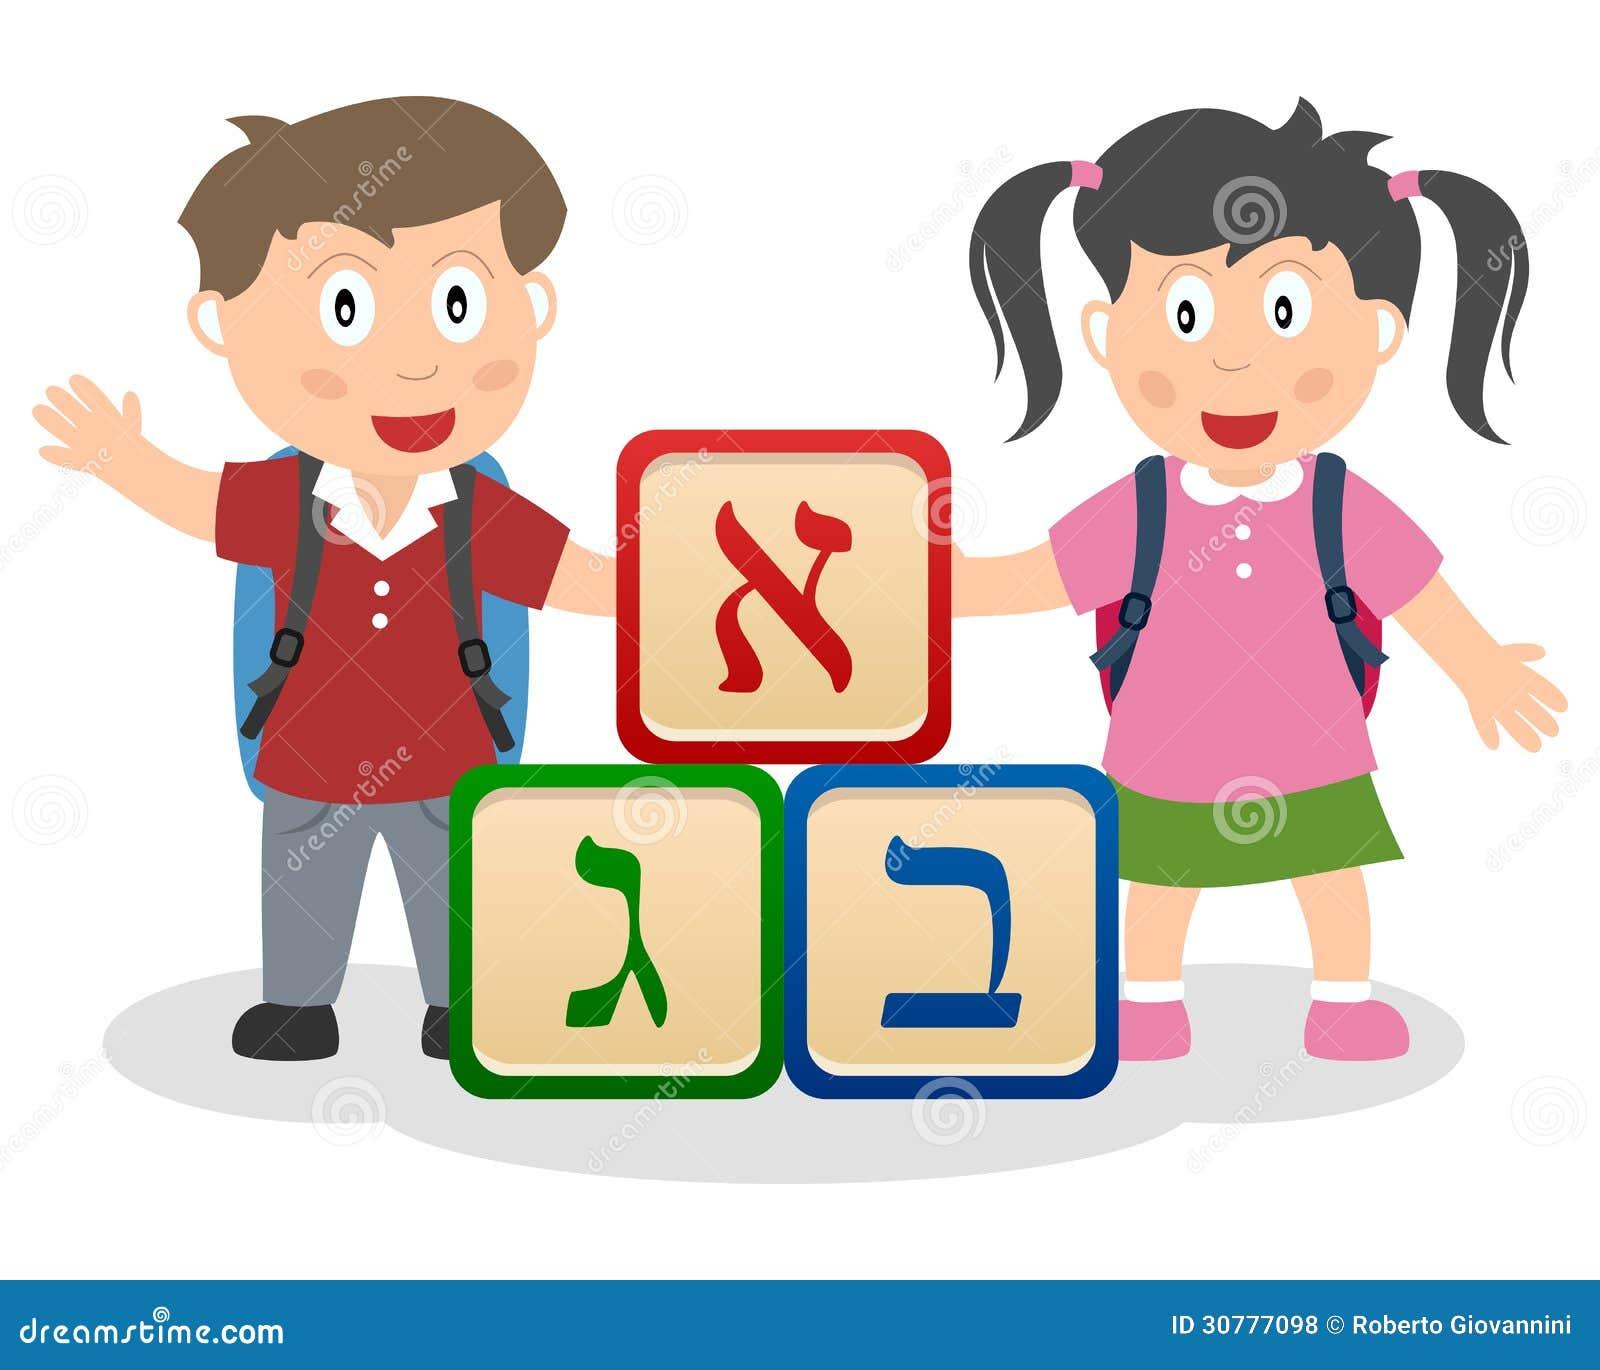 peaceful parent happy kid pdf download